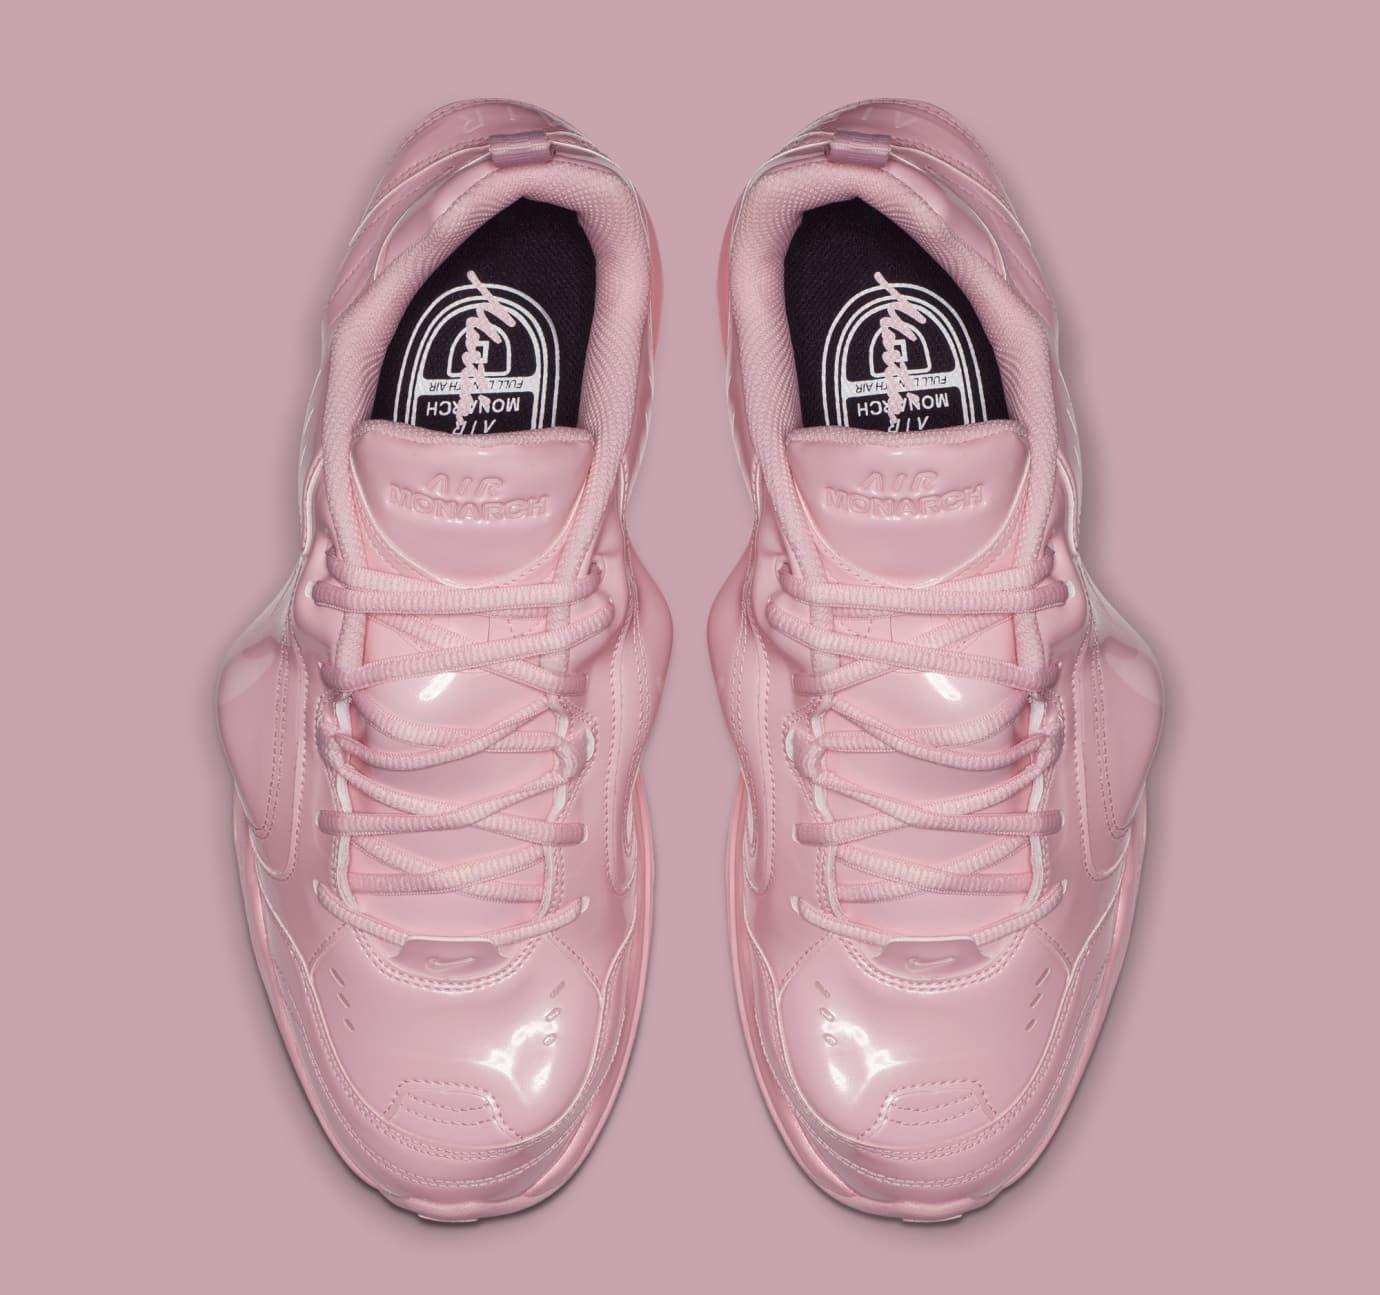 655b94758972 Martine Rose x Nike Air Monarch 4  Medium Soft Pink